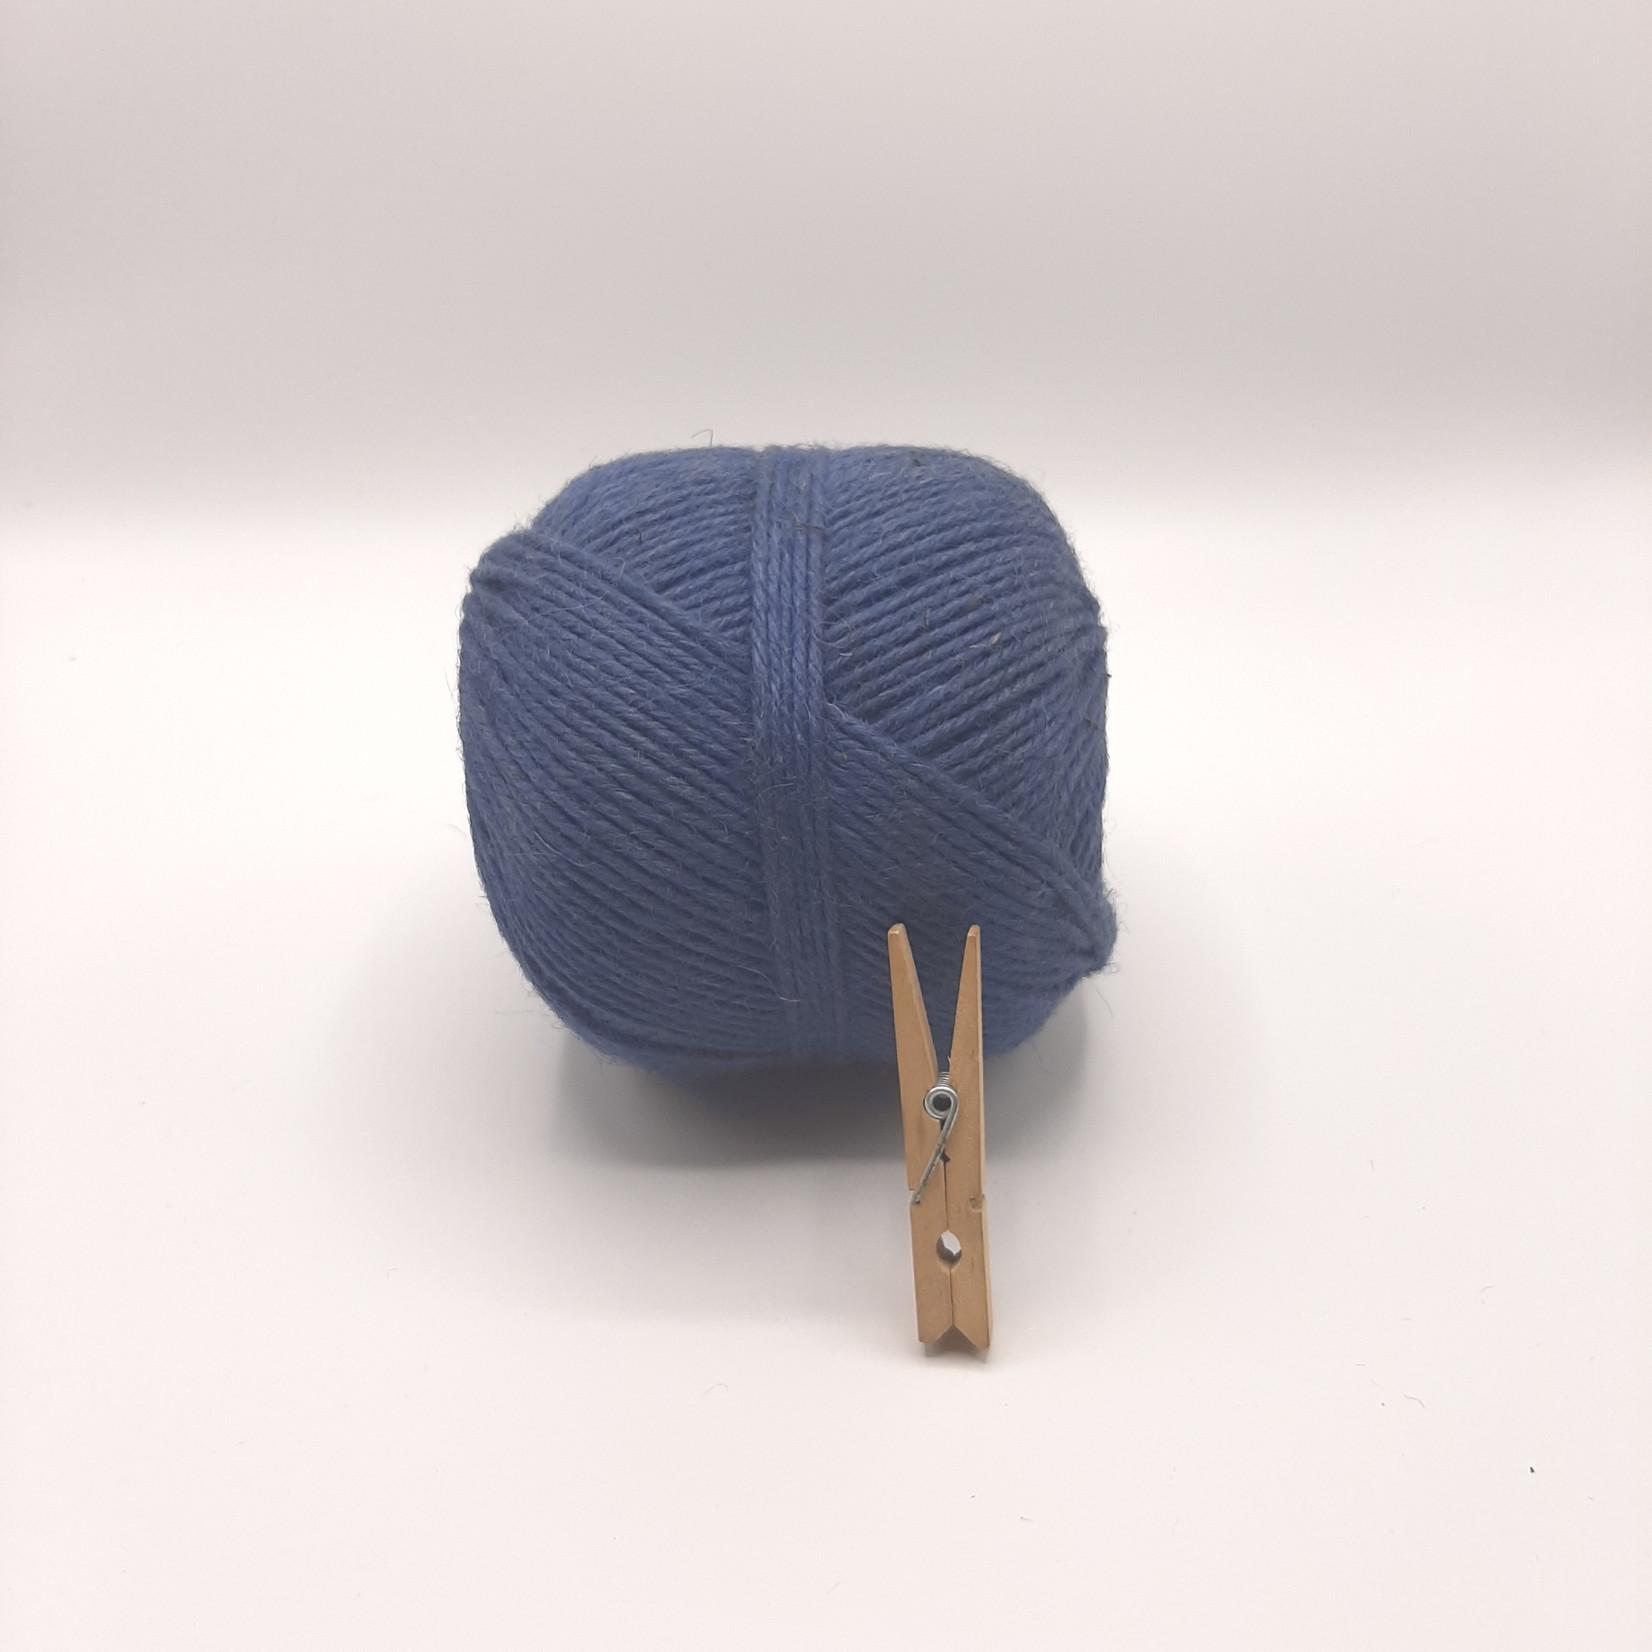 HollandWool Jute touw 500 gr. = 200 m. - kleur blauw  - 2.5 mm. dik